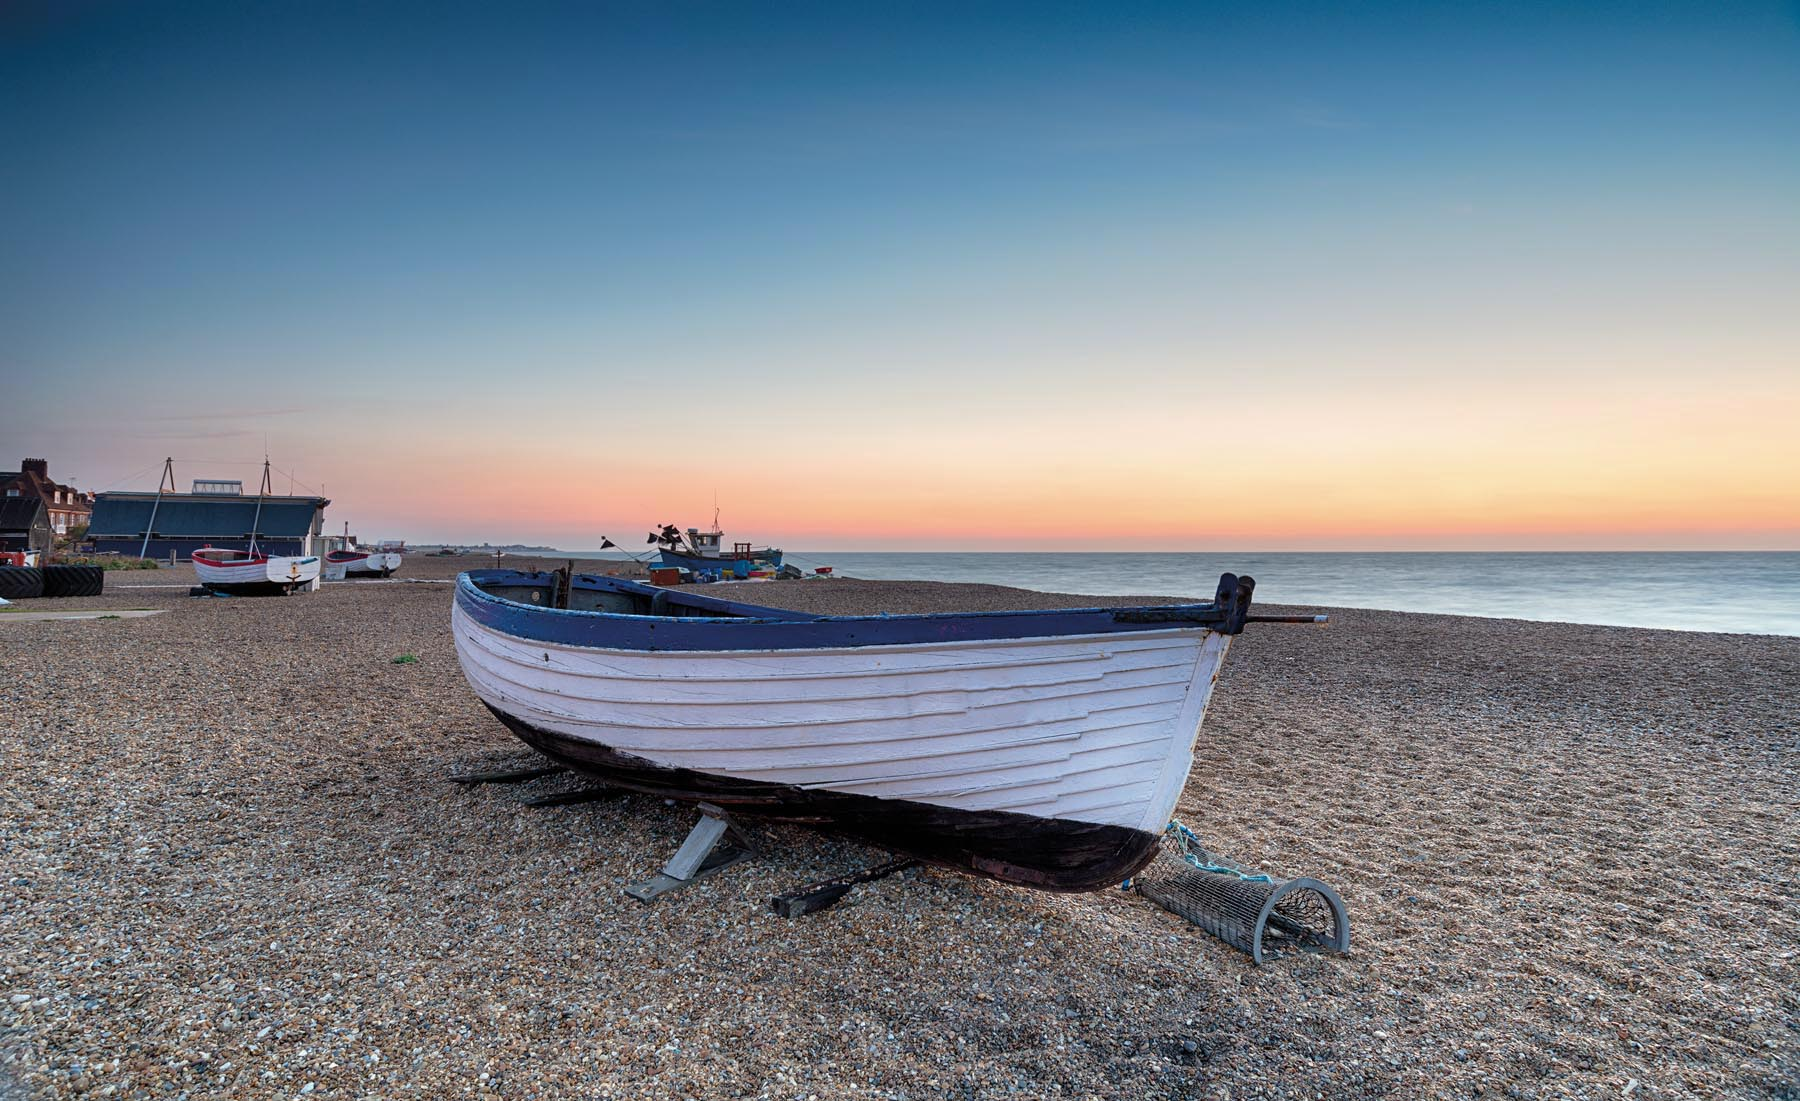 A Boat On A Beach In Suffolk